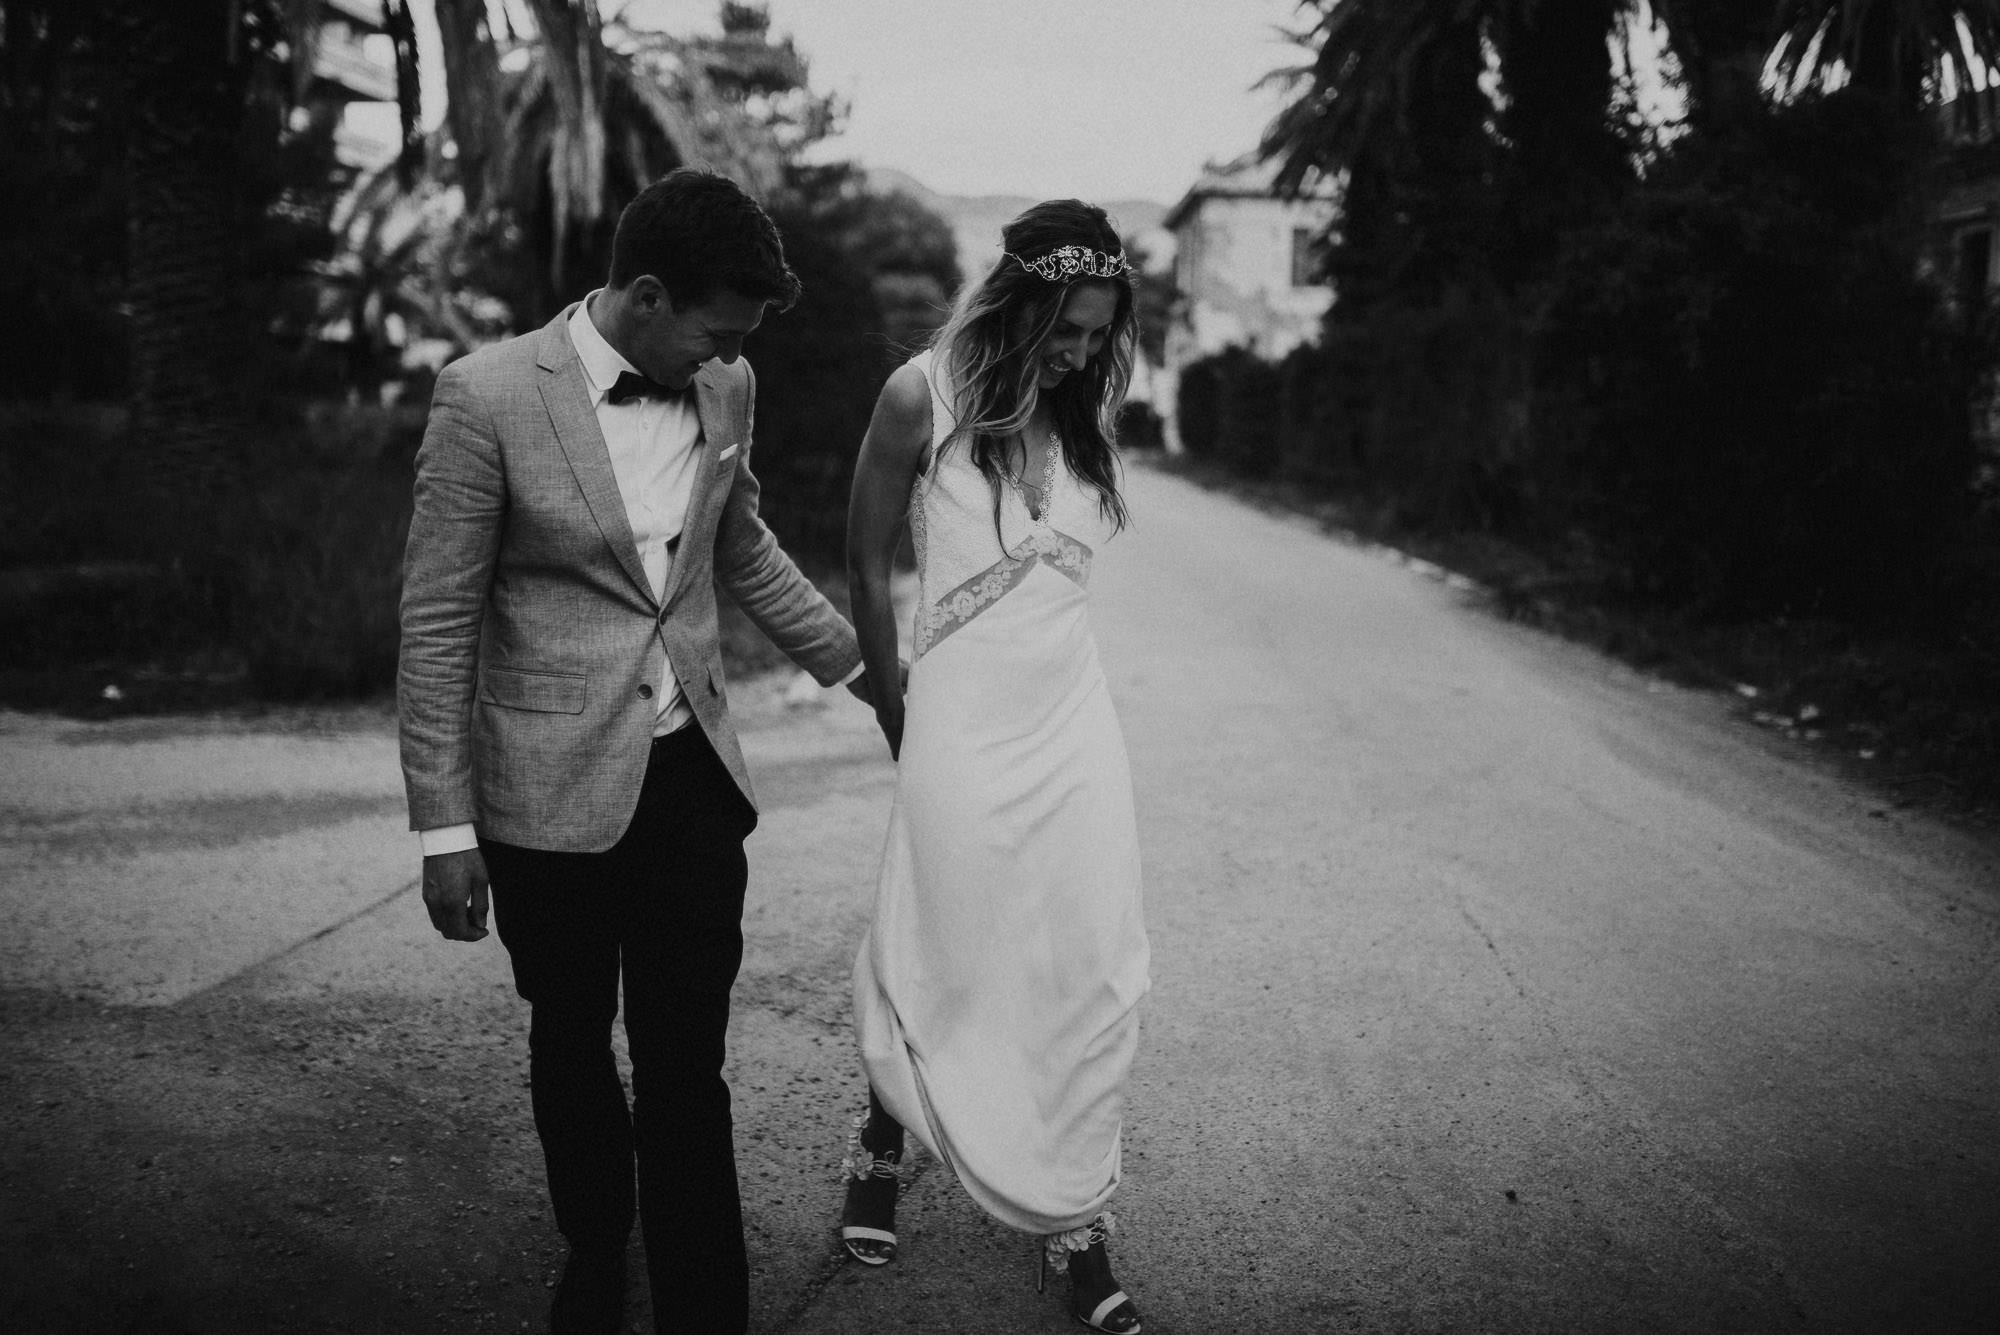 dubrovnik_croatia_wedding_photographer-jere_satamo-destination_weddings-107-web.jpg